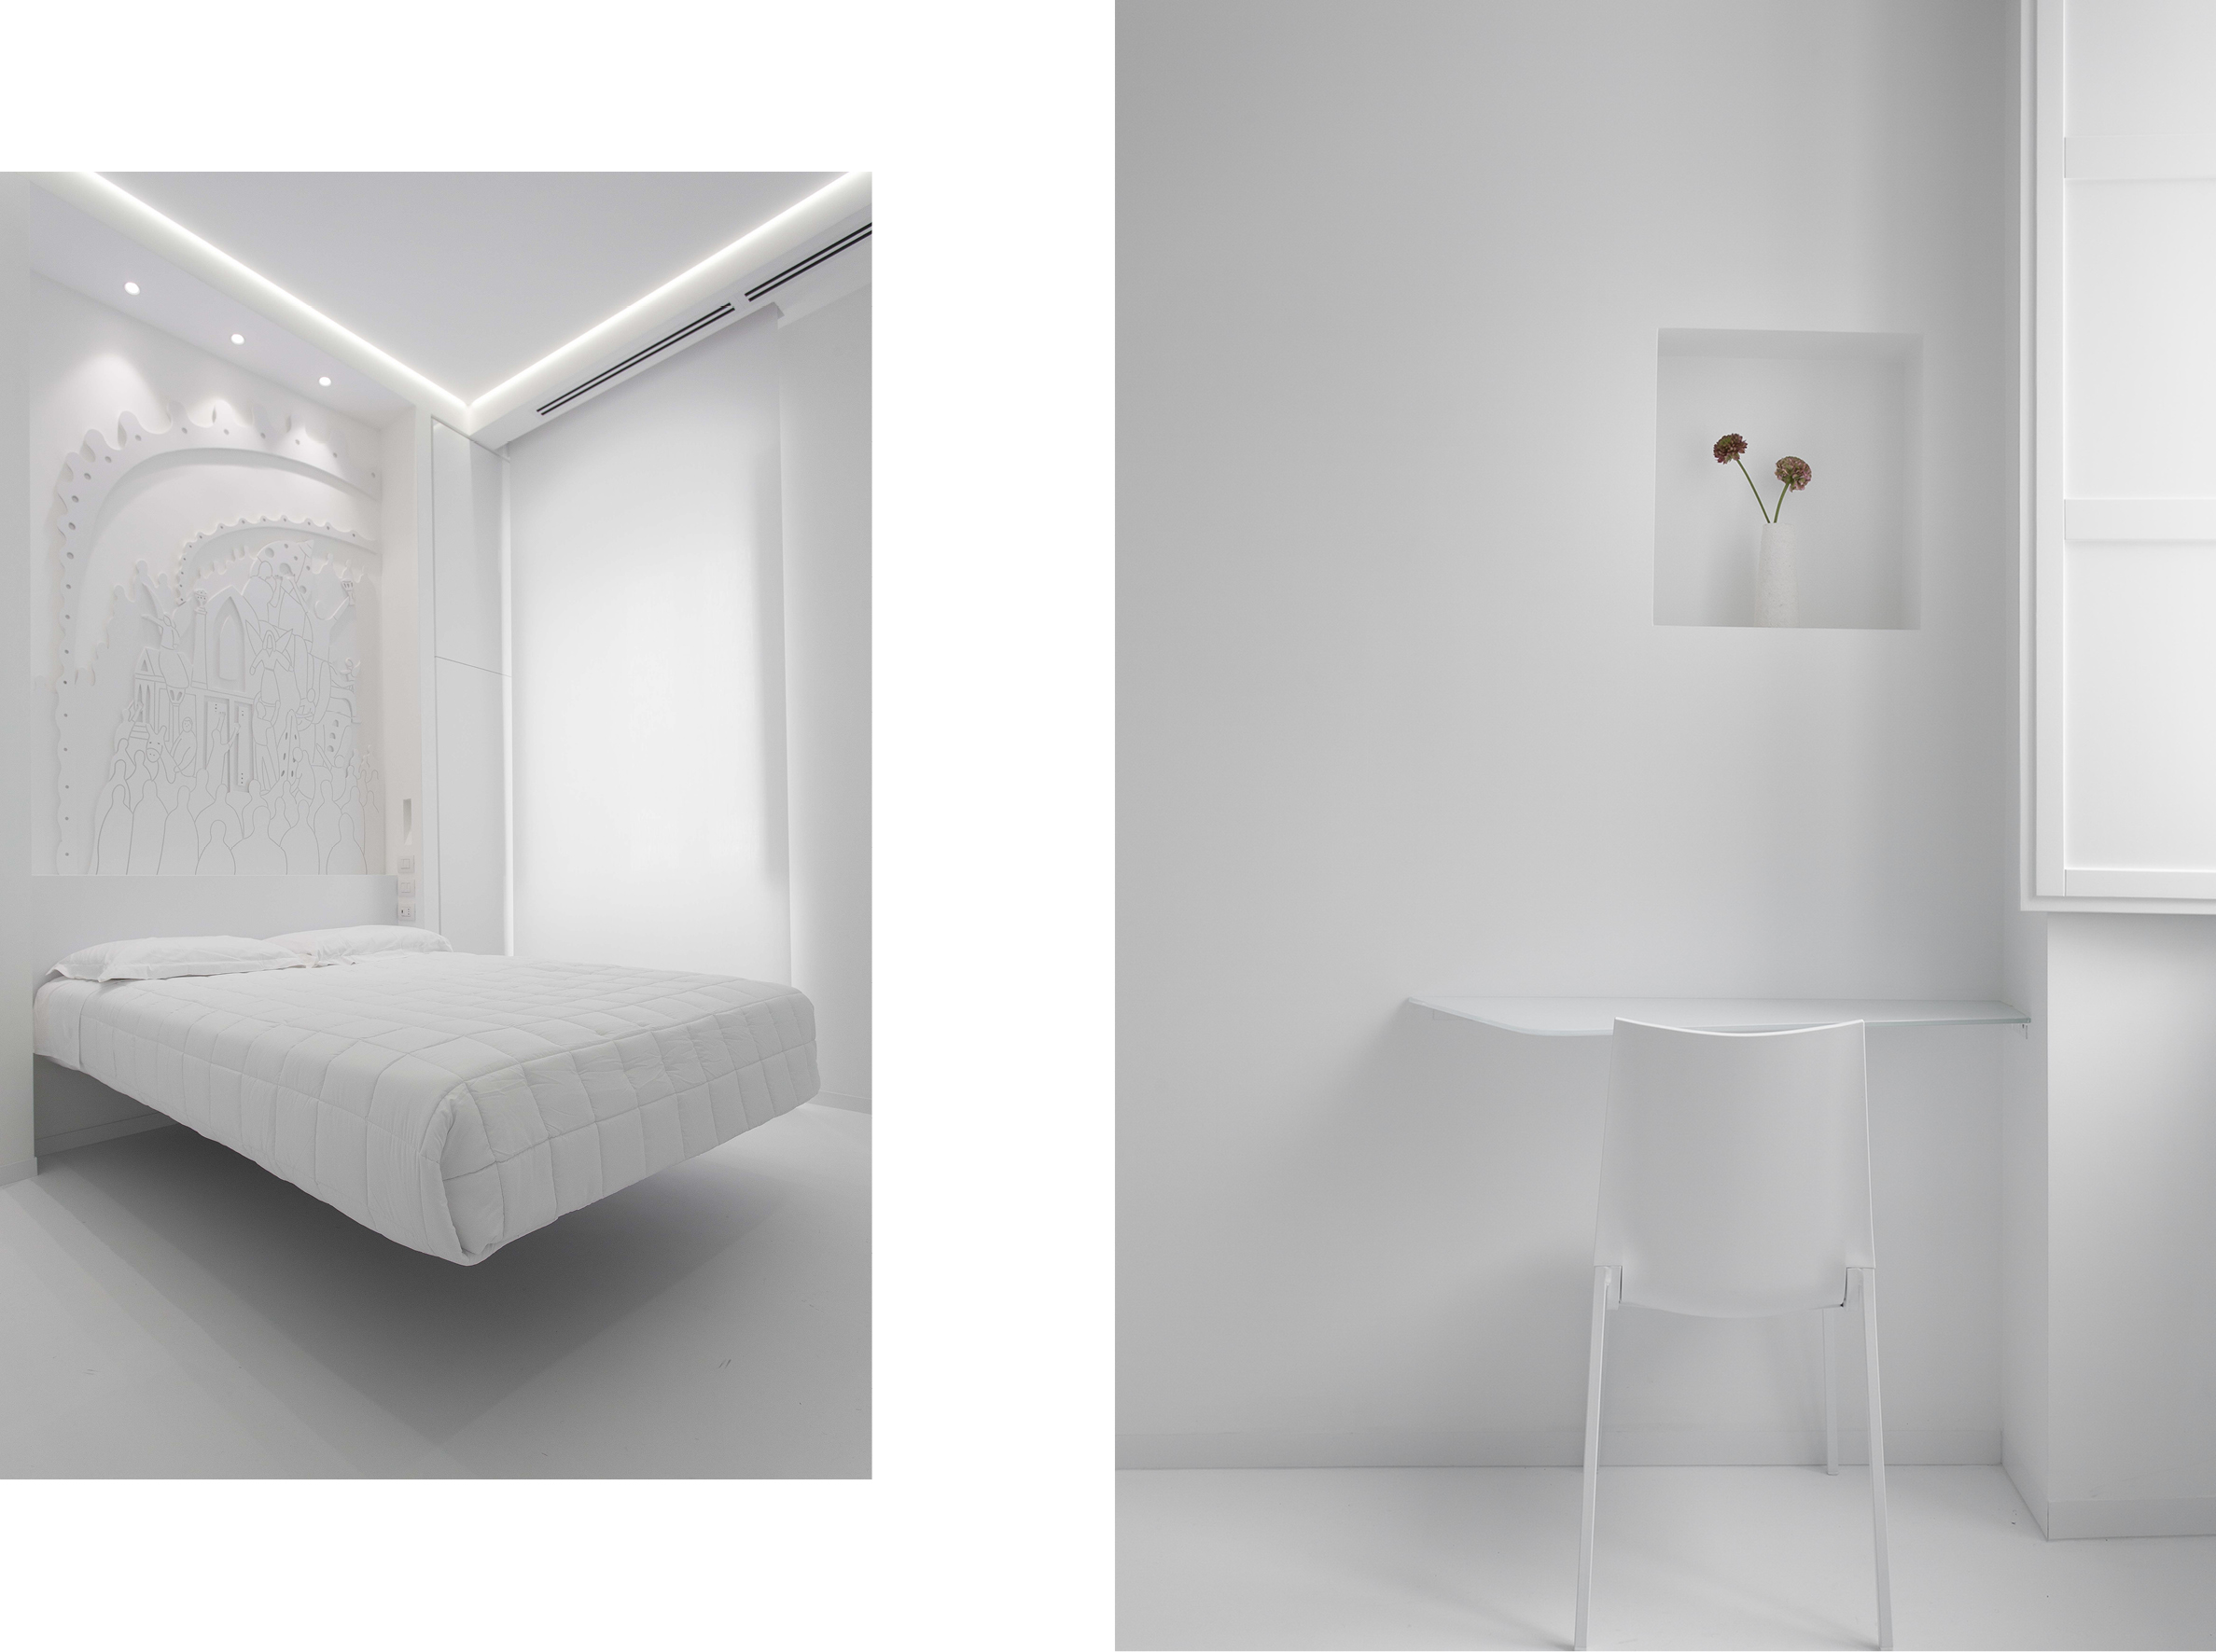 interior photographer fotografo matera interni minimal photographicframe manzi giuseppe